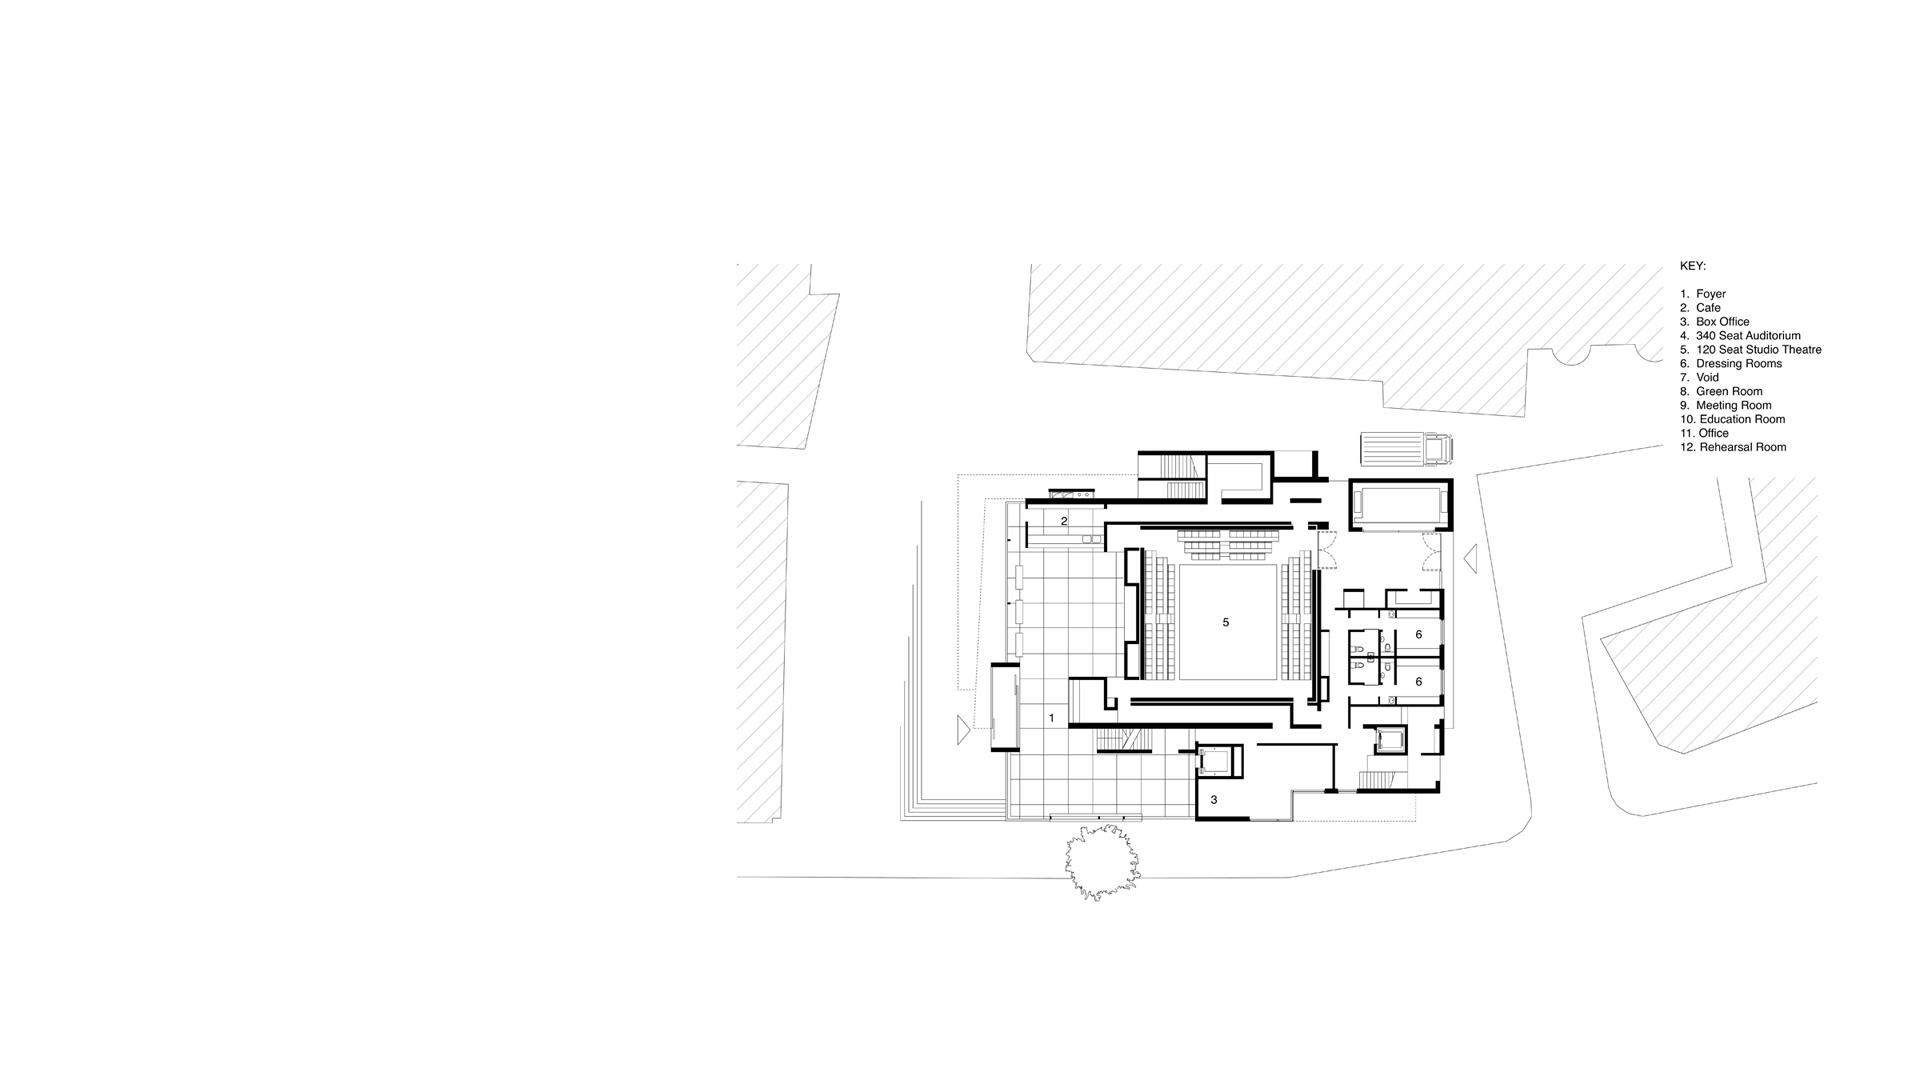 Entrance level plan with the Clore Studio at London's Unicorn Theatre